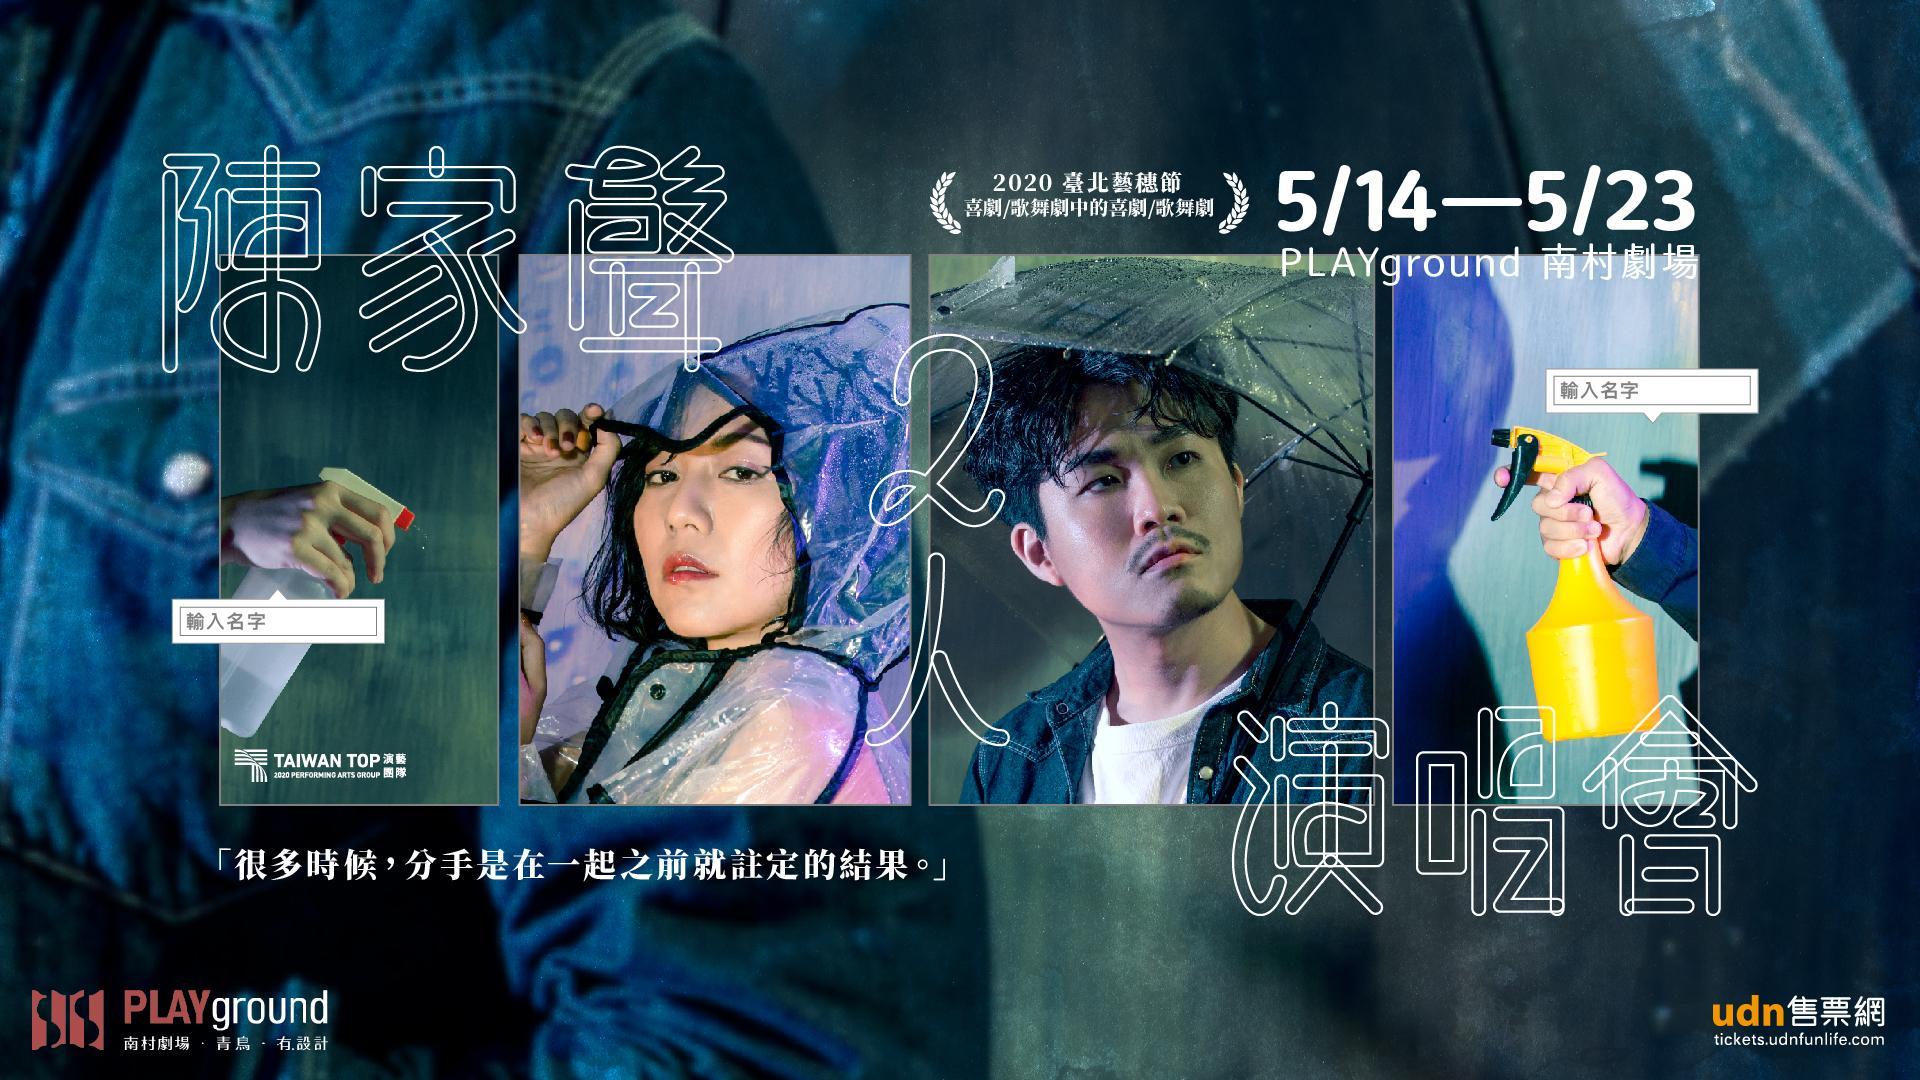 【2021 PLAYground 】陳家聲工作室《陳家聲2人演唱會》